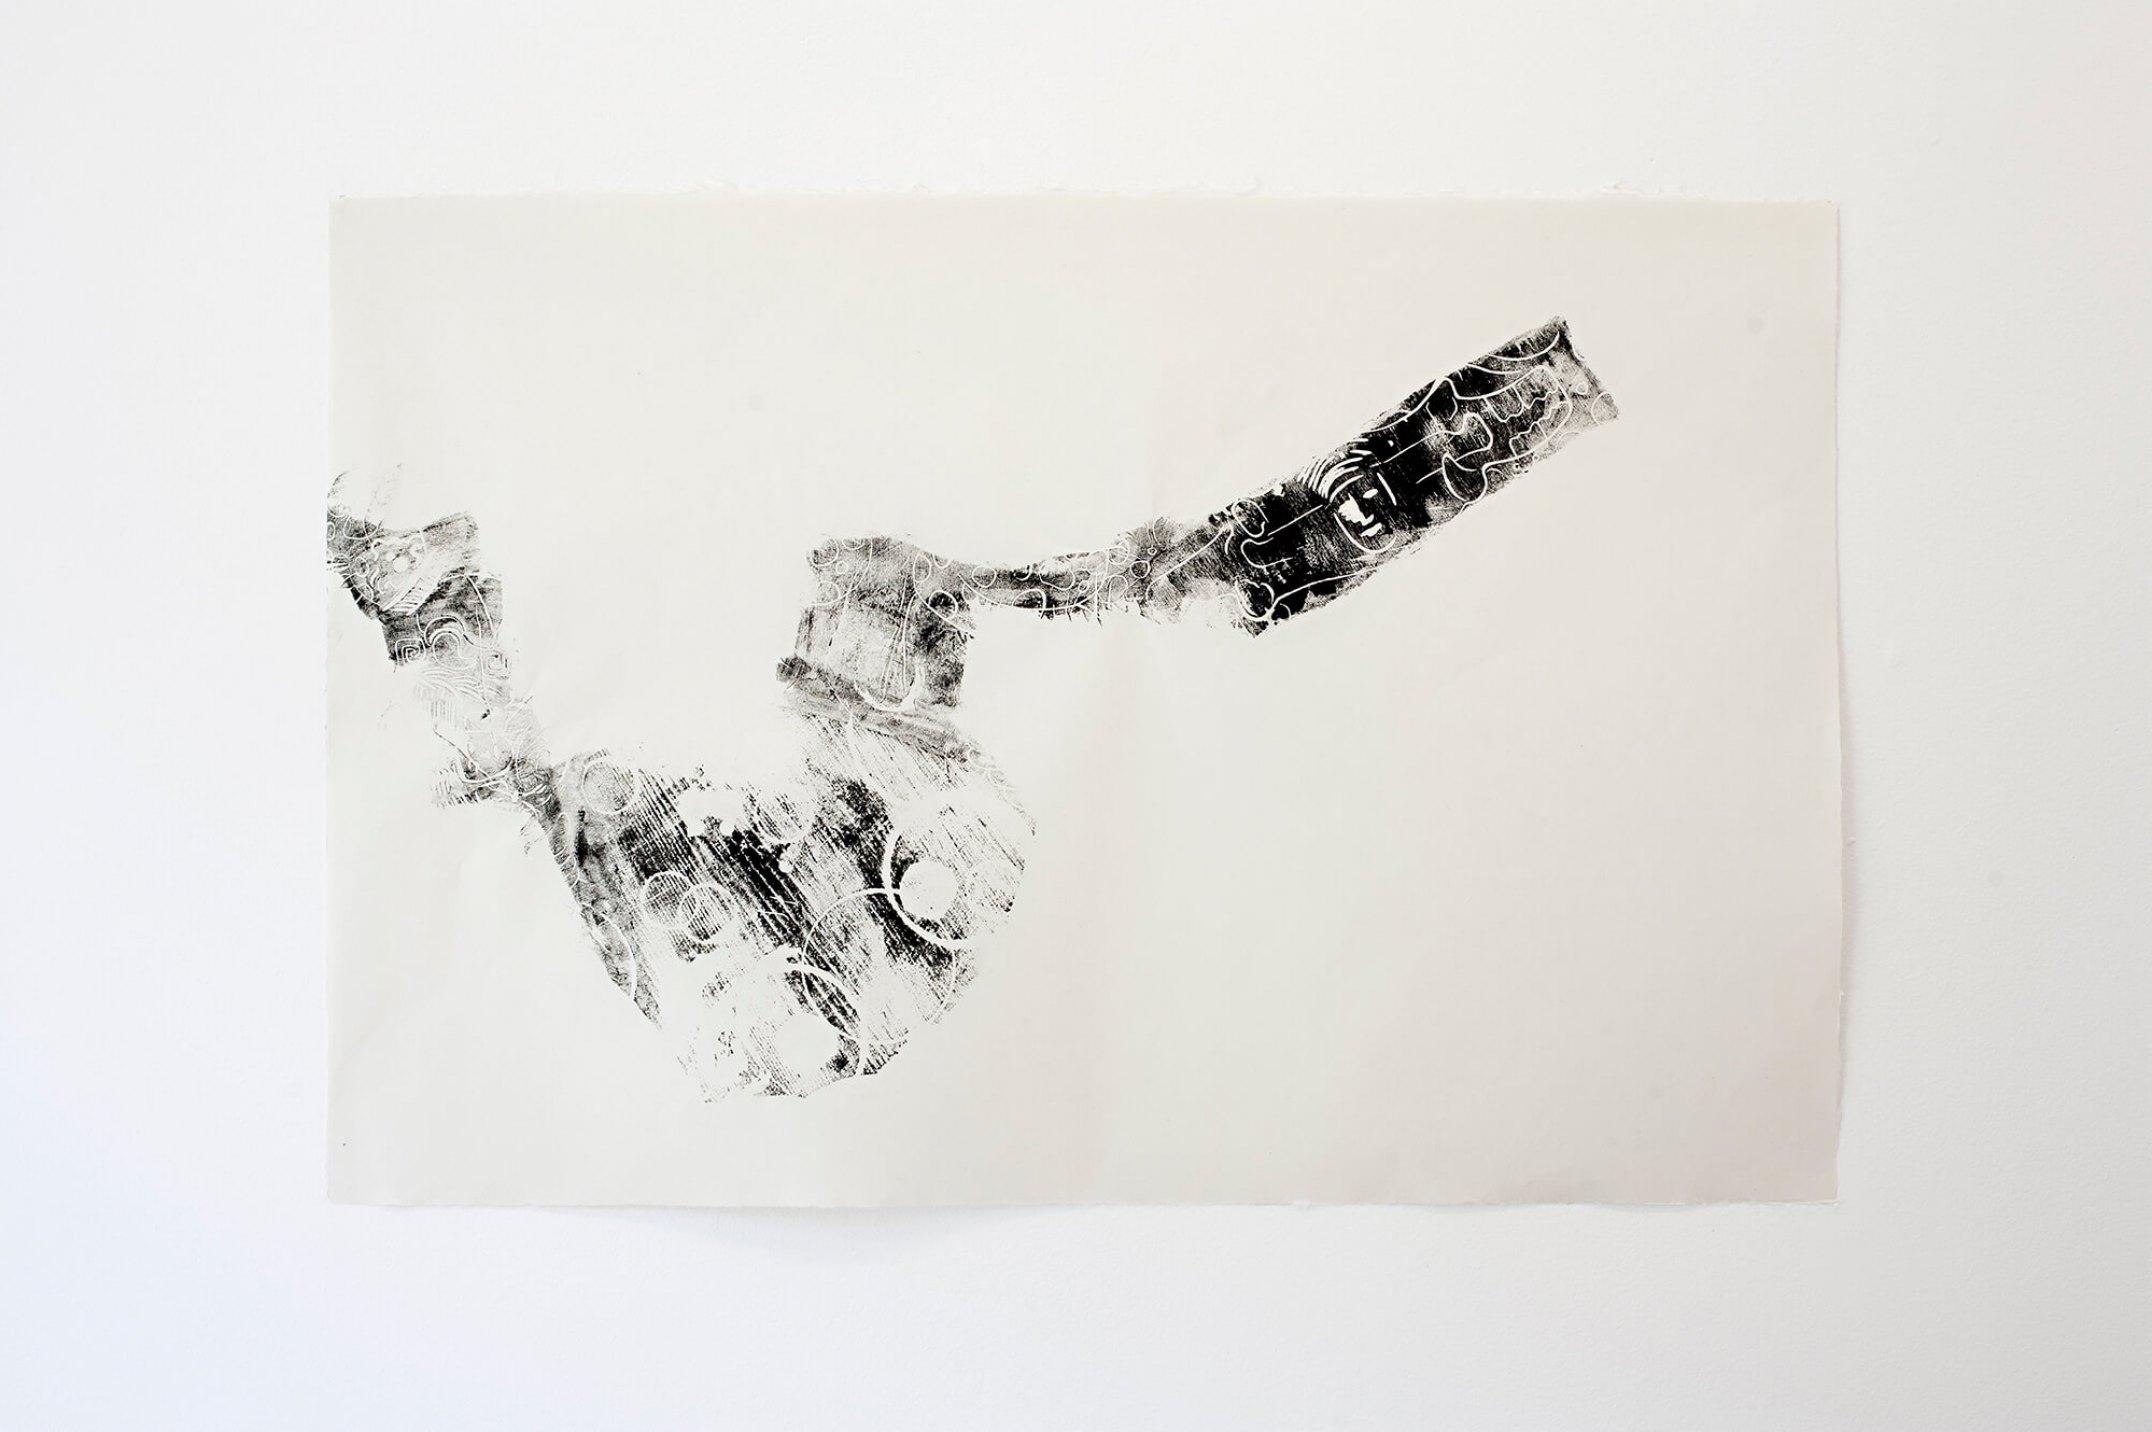 Mariana Castillo Deball,<em>Zoomorph G Imprint 10</em>,2013, monoprint on Hosokawa paper 39g, 61 × 91 cm - Mendes Wood DM